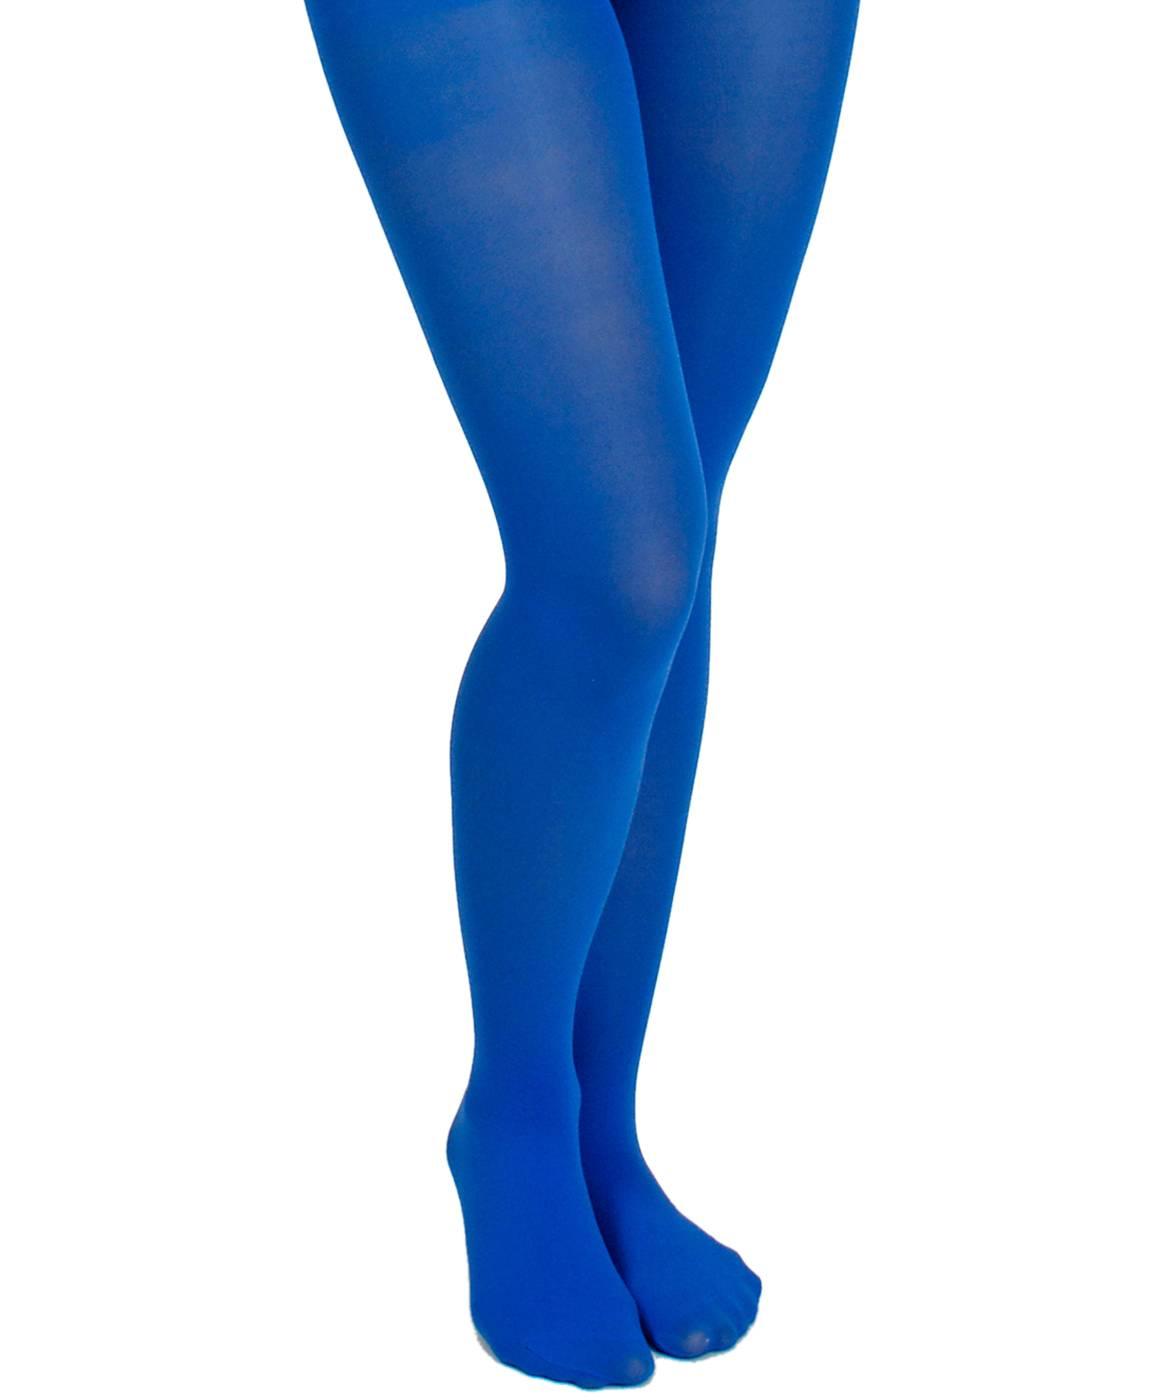 Collant-bleu-femme-XL